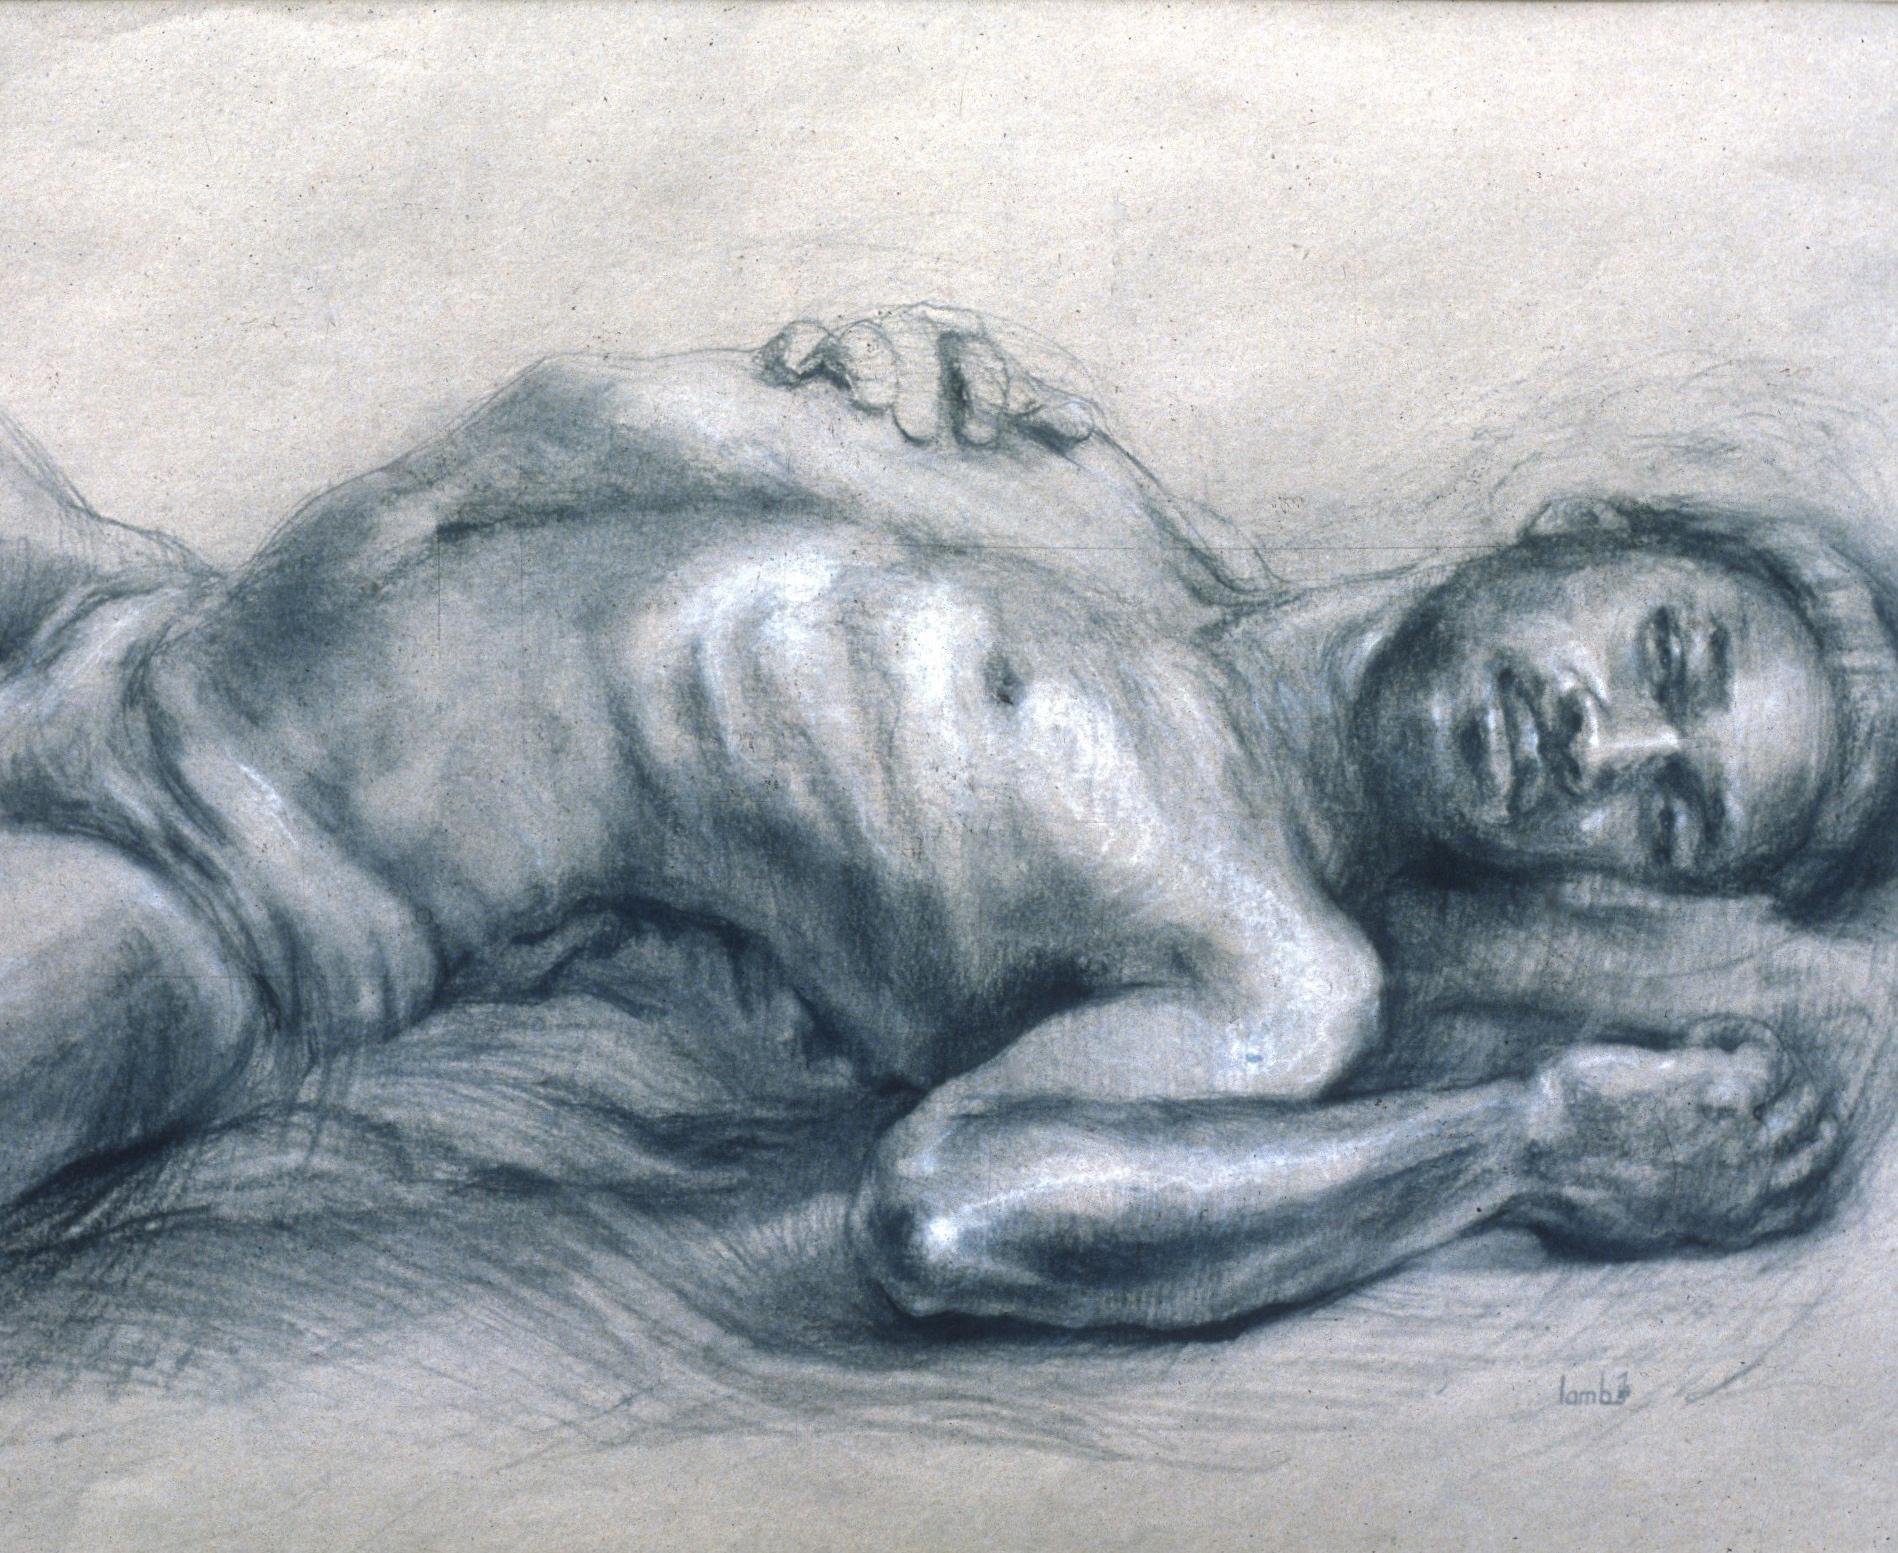 "Lou Ann Burkhardt  Runako Jahid   ,  1980 Charcoal and white chalk on toned paper 24"" x 30"" framed"